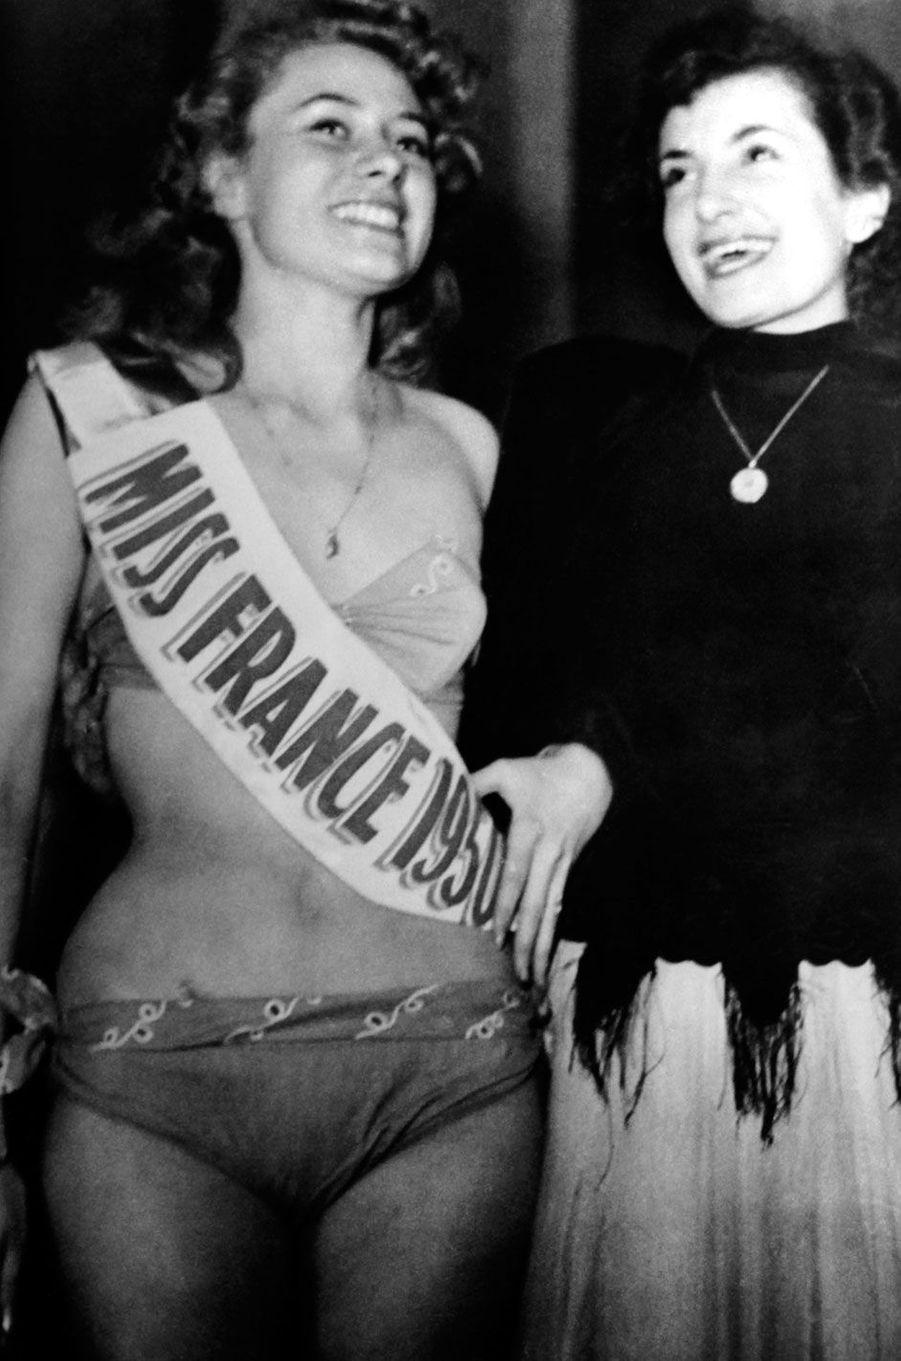 Miss France 1950, Maryse Delort